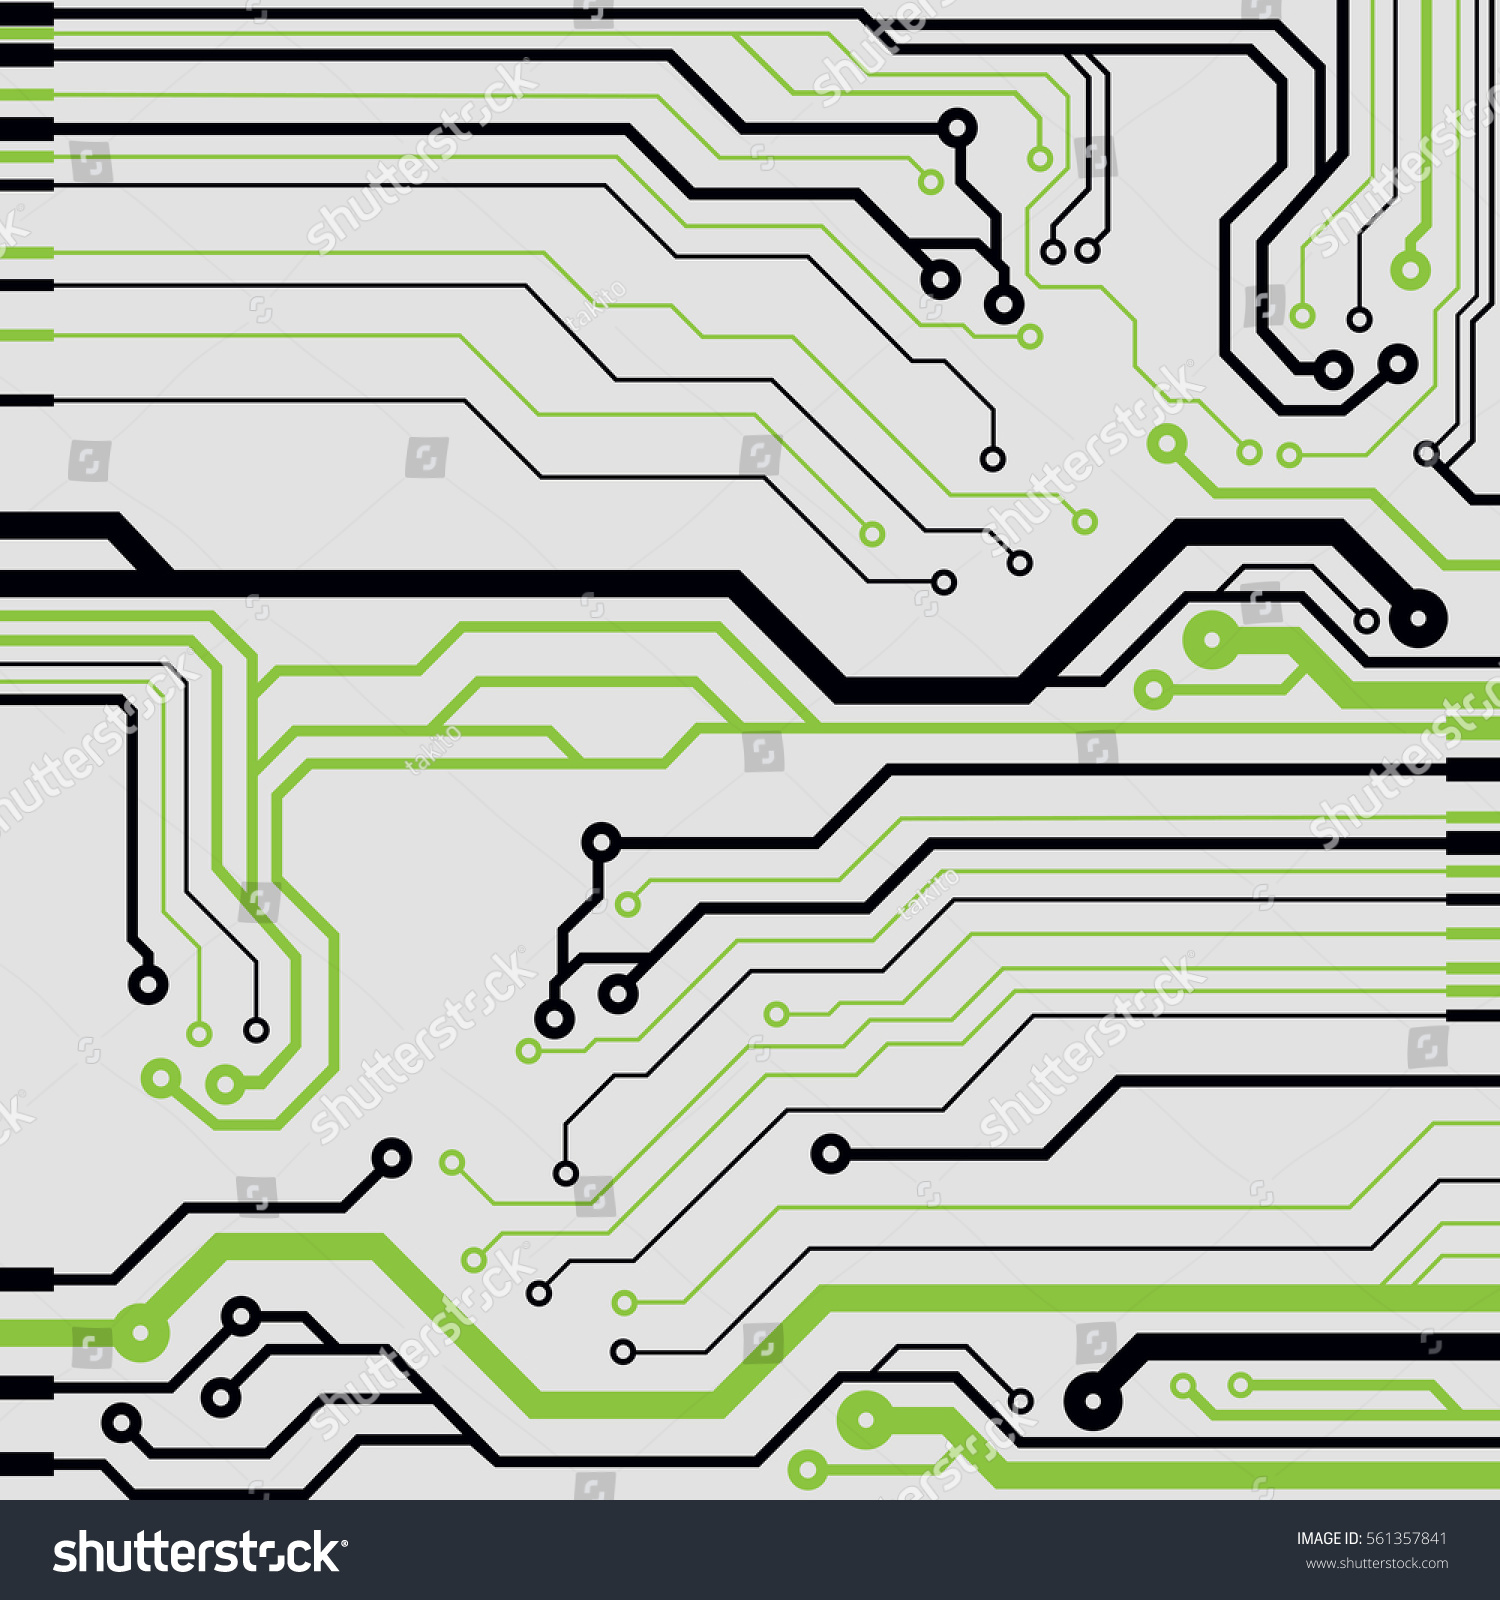 Vector Circuit Board Illustration Stock Royalty Free